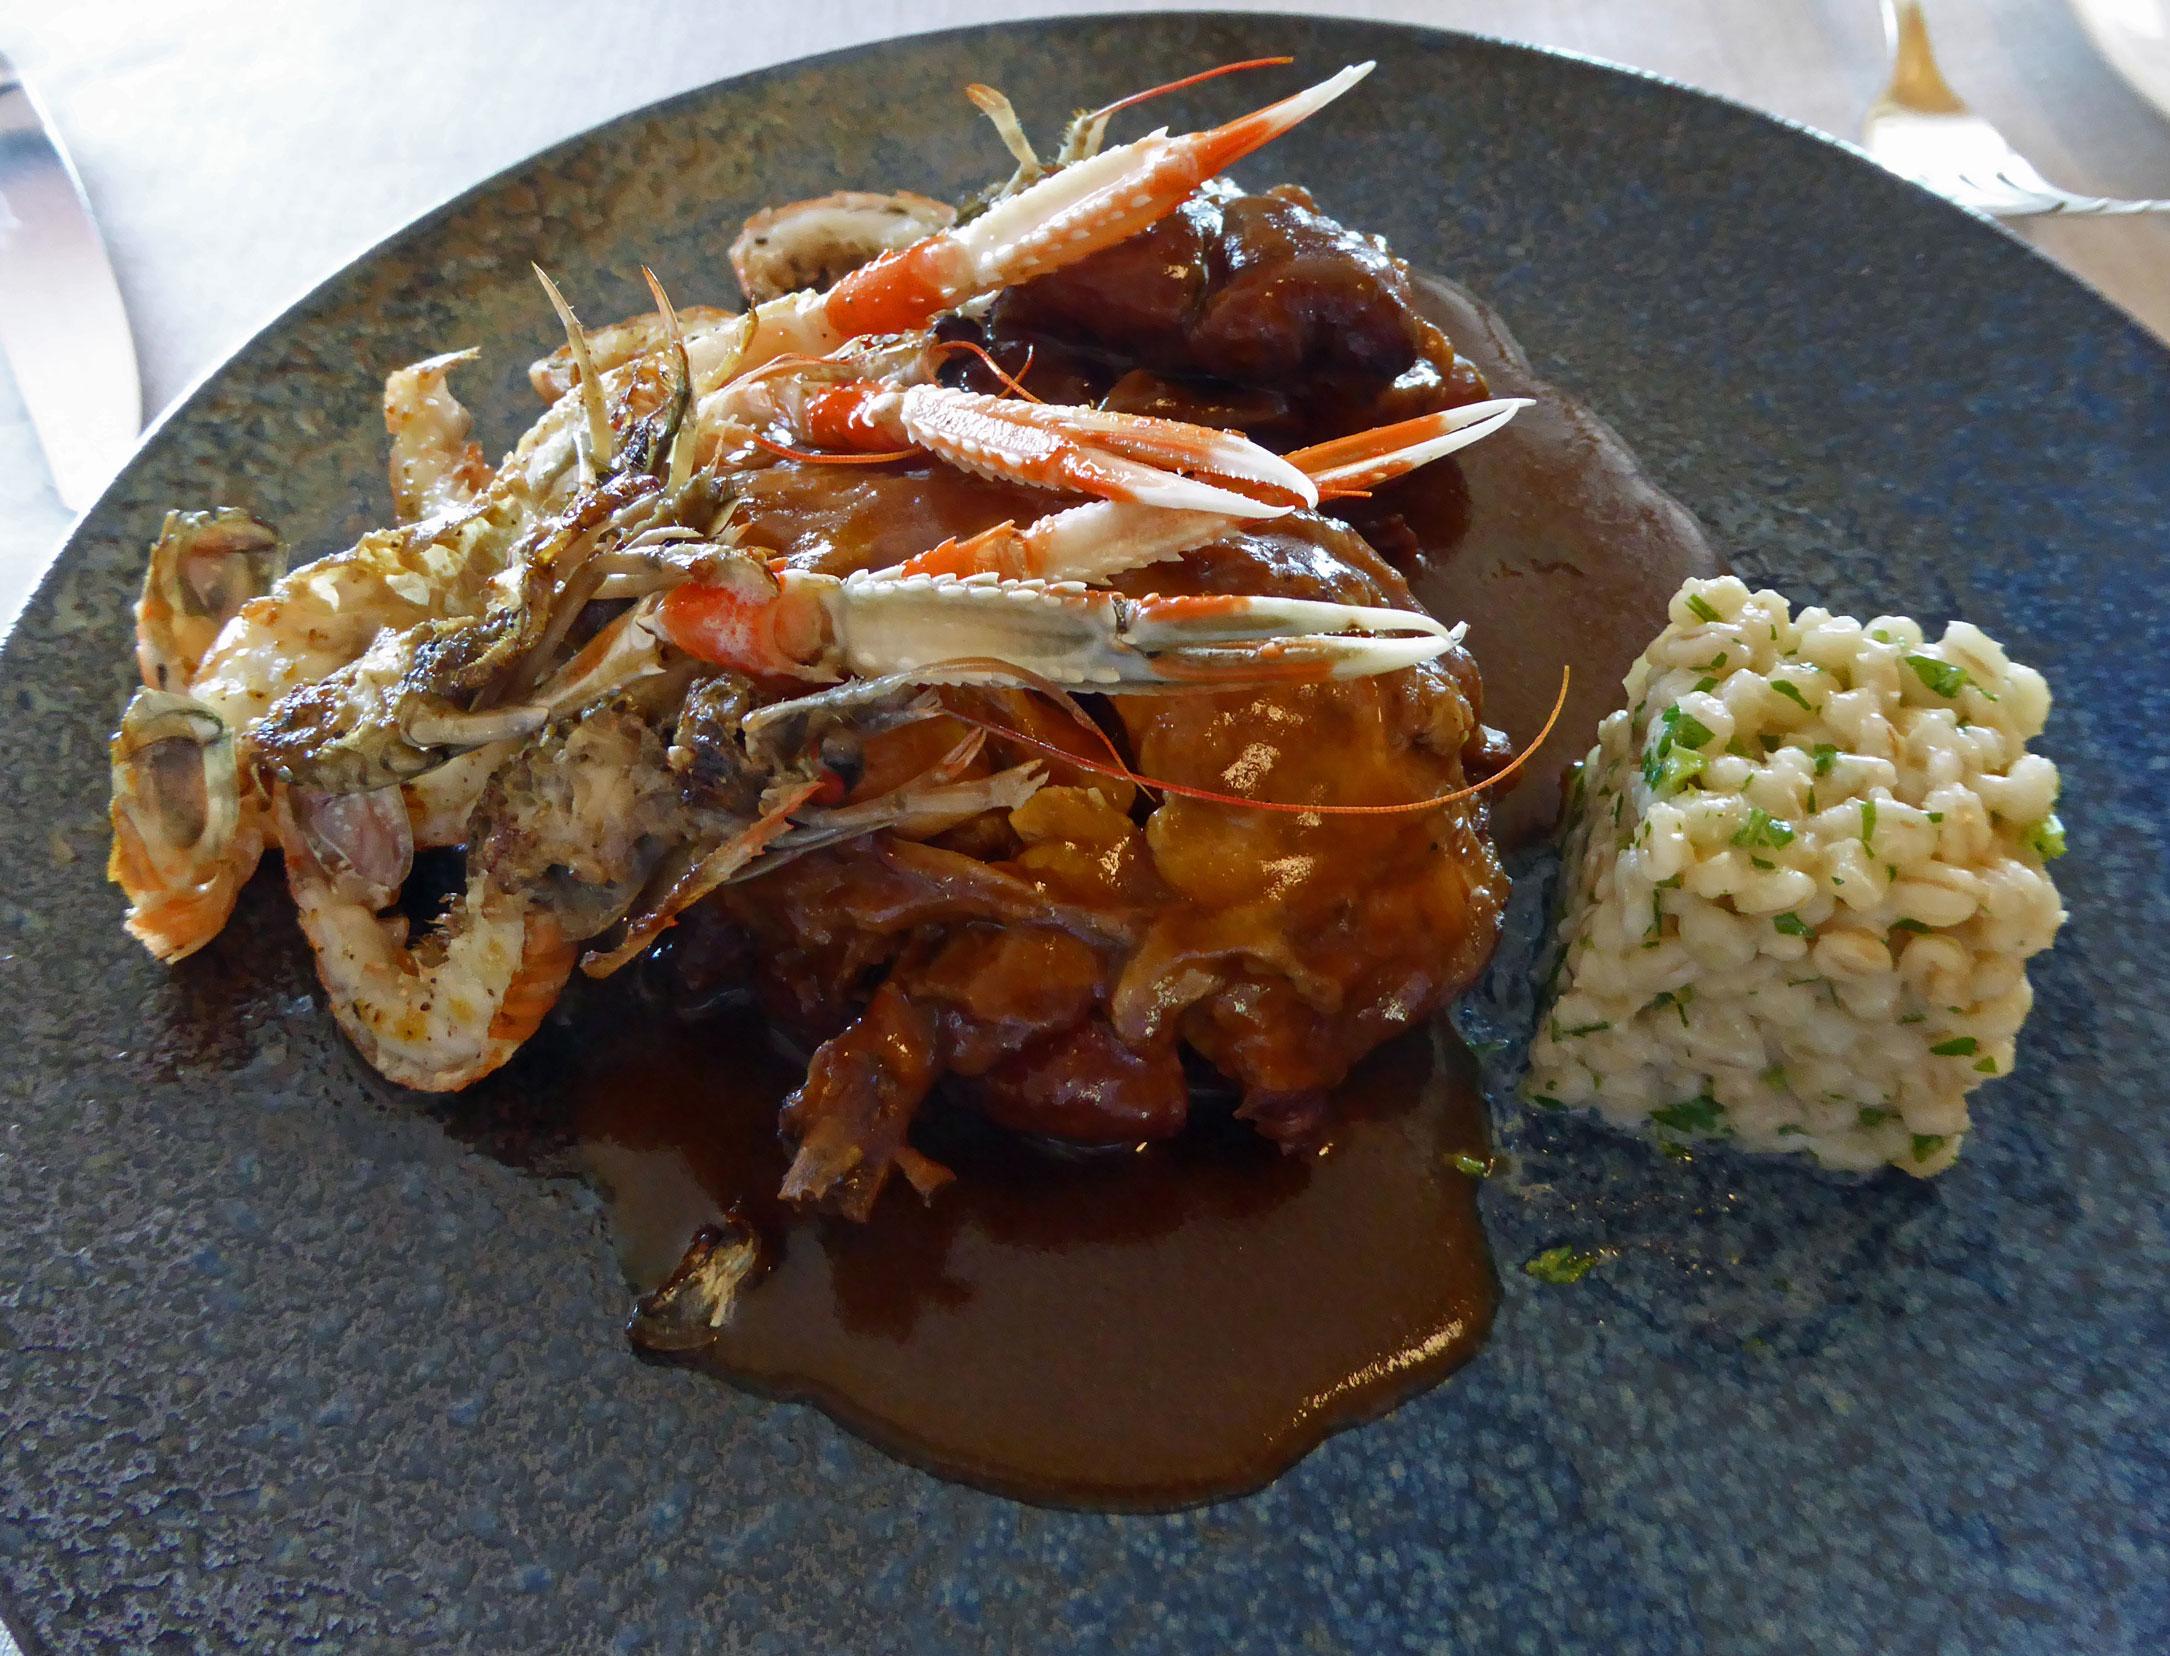 Restaurante El Motel Pollo de corral (grano) con cigalas de Llança acompañado de un falso risotto de bulgur